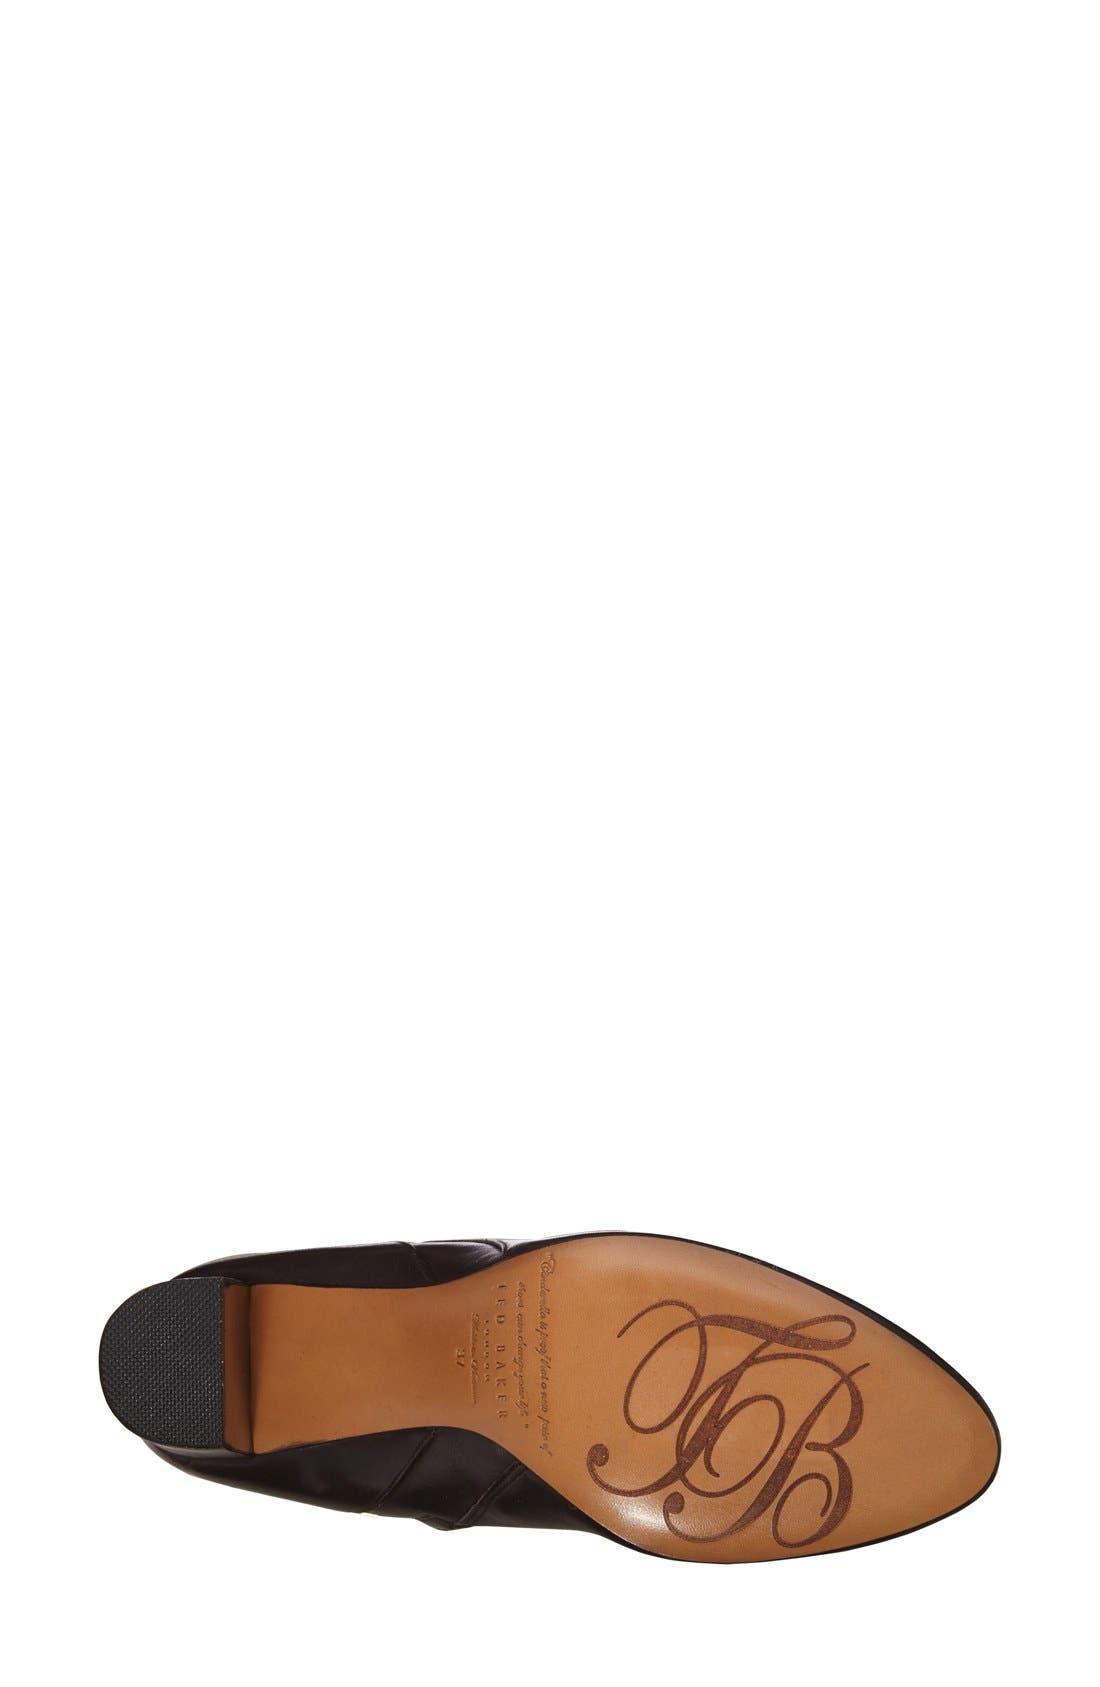 Alternate Image 4  - Ted Baker London 'Micka' Leather Boot (Women)